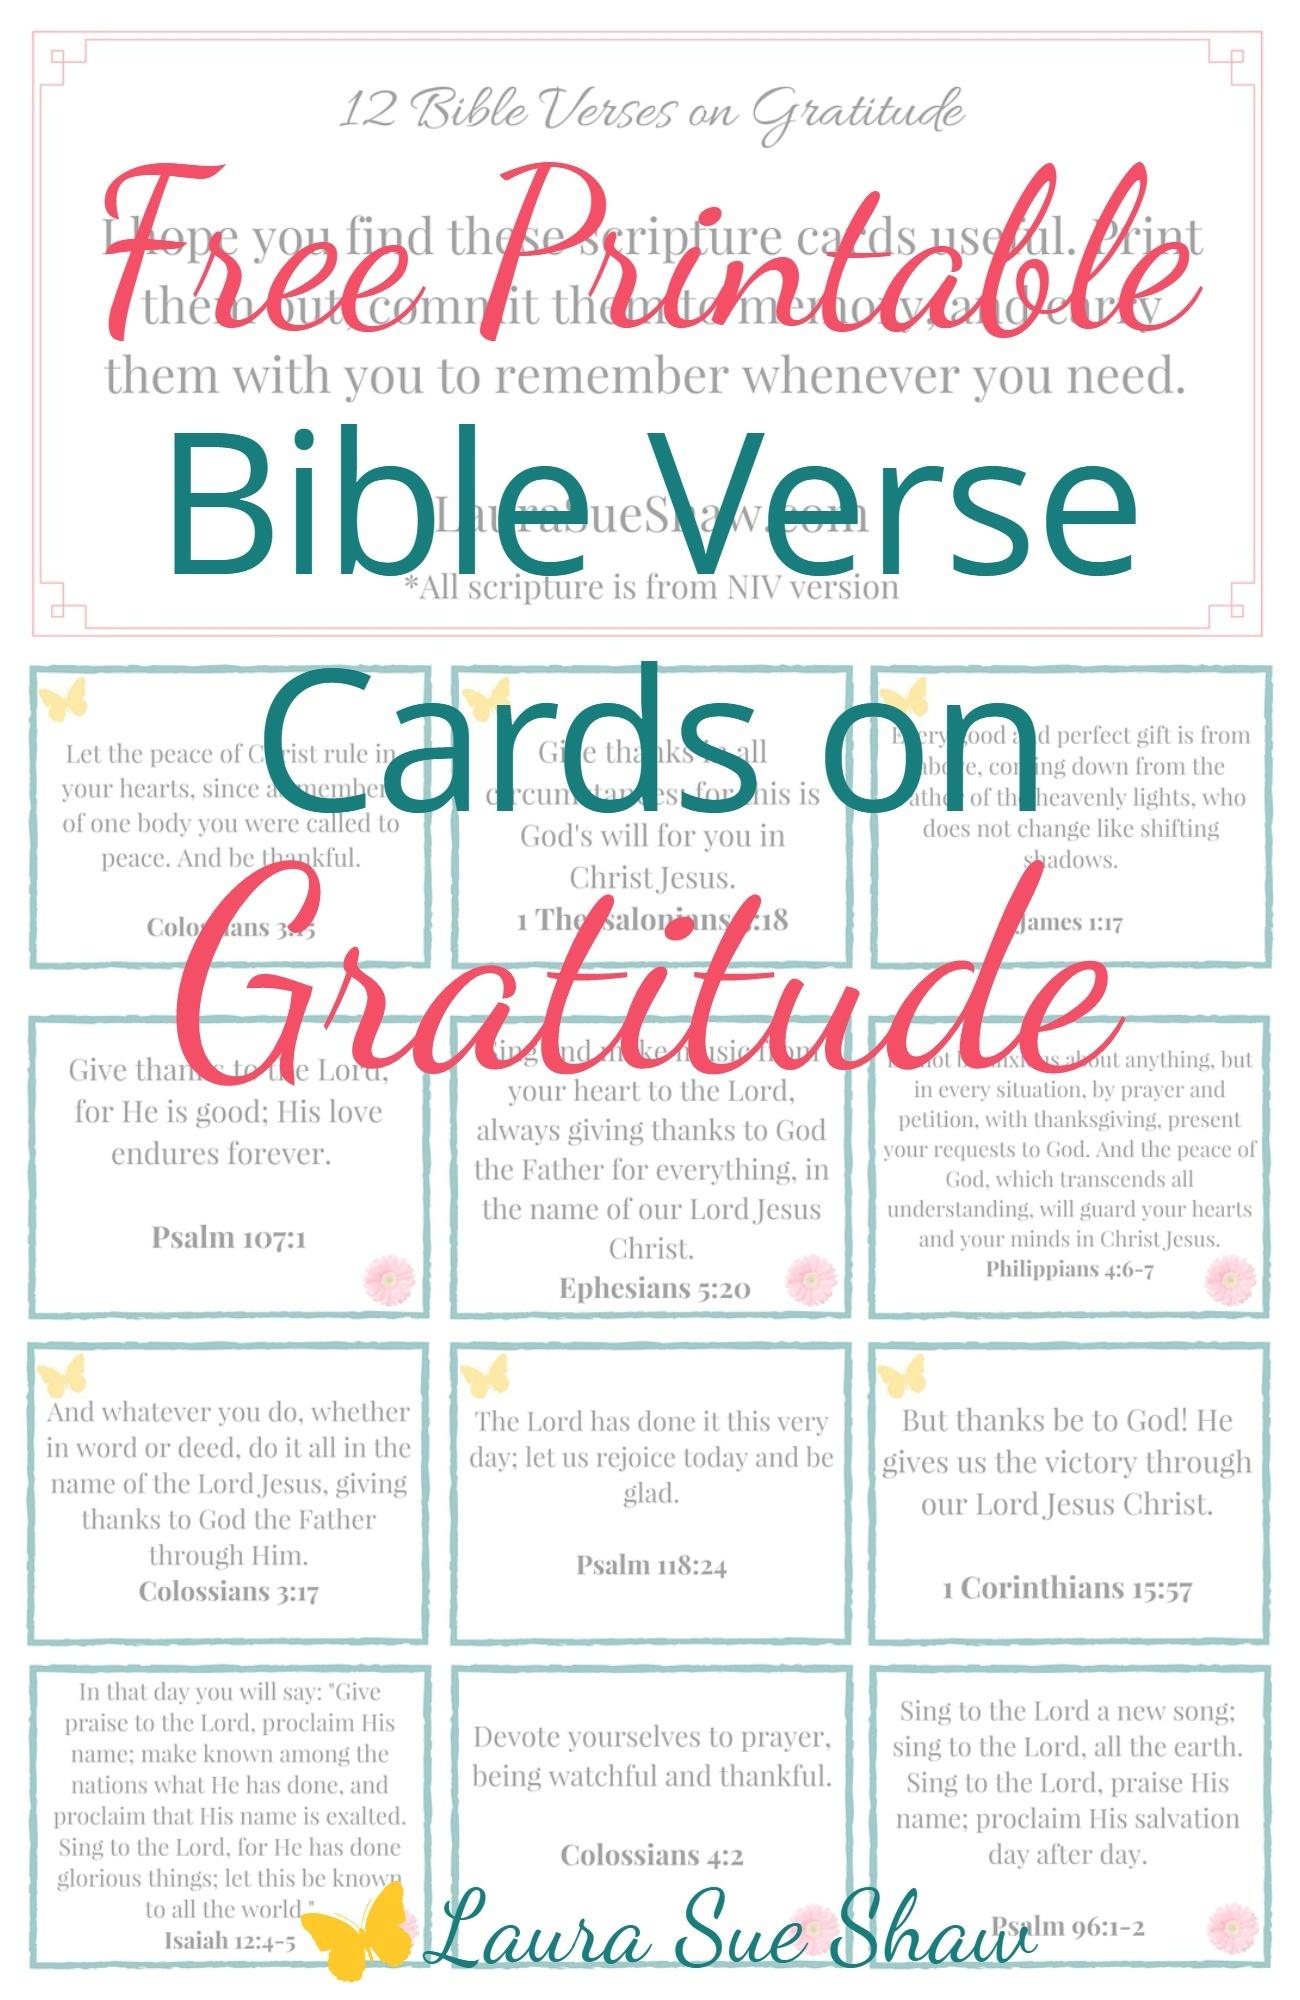 Free Printable Bible Verse Cards On Gratitude - Laura Sue Shaw - Free Printable Bible Verse Cards